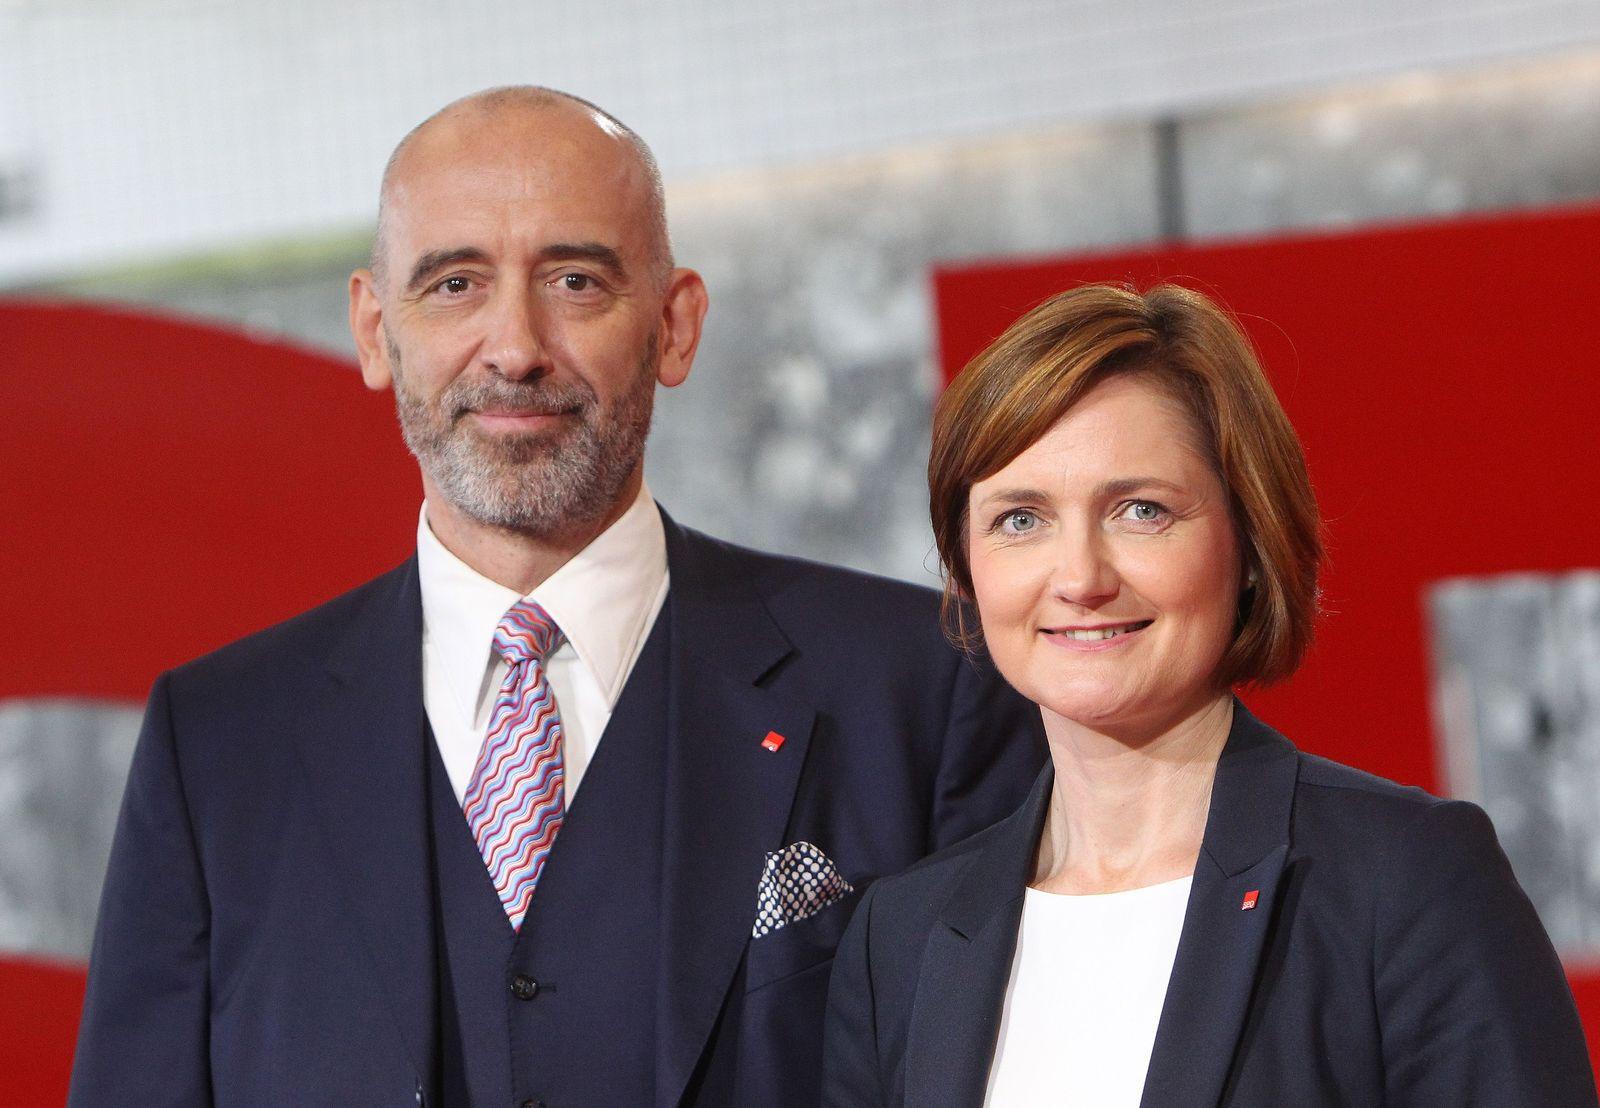 Alexander Ahrens & Simone Lange